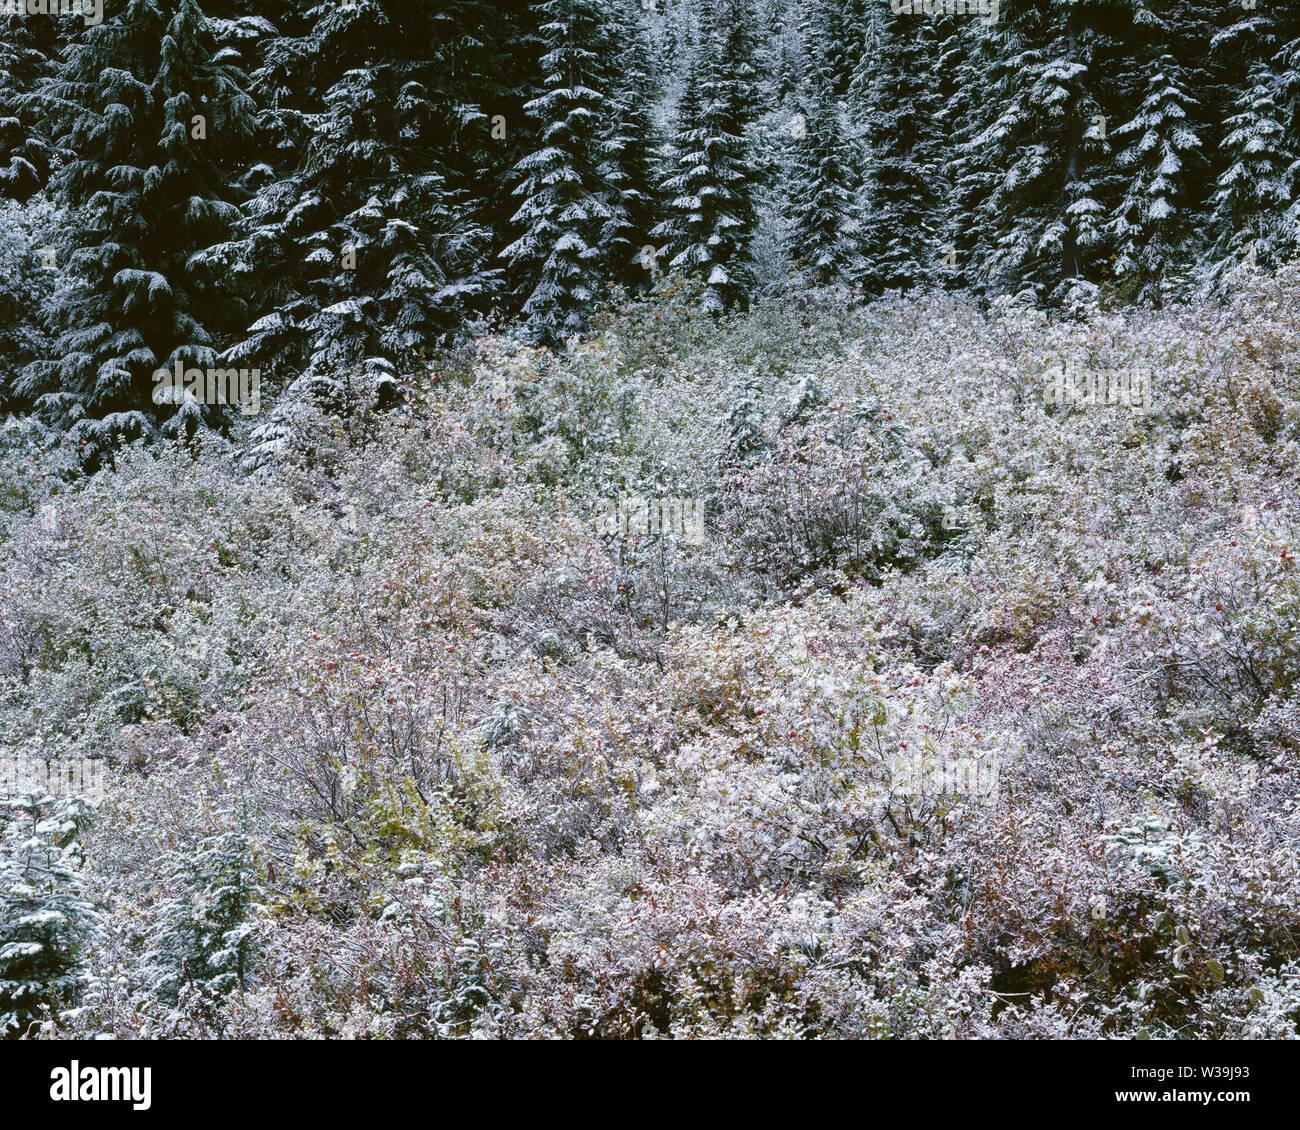 USA, Washington, Mt. Rainier National Park, Early autumn snow on fall colored mountain ash and huckleberry near edge of evergreen forest. Stock Photo